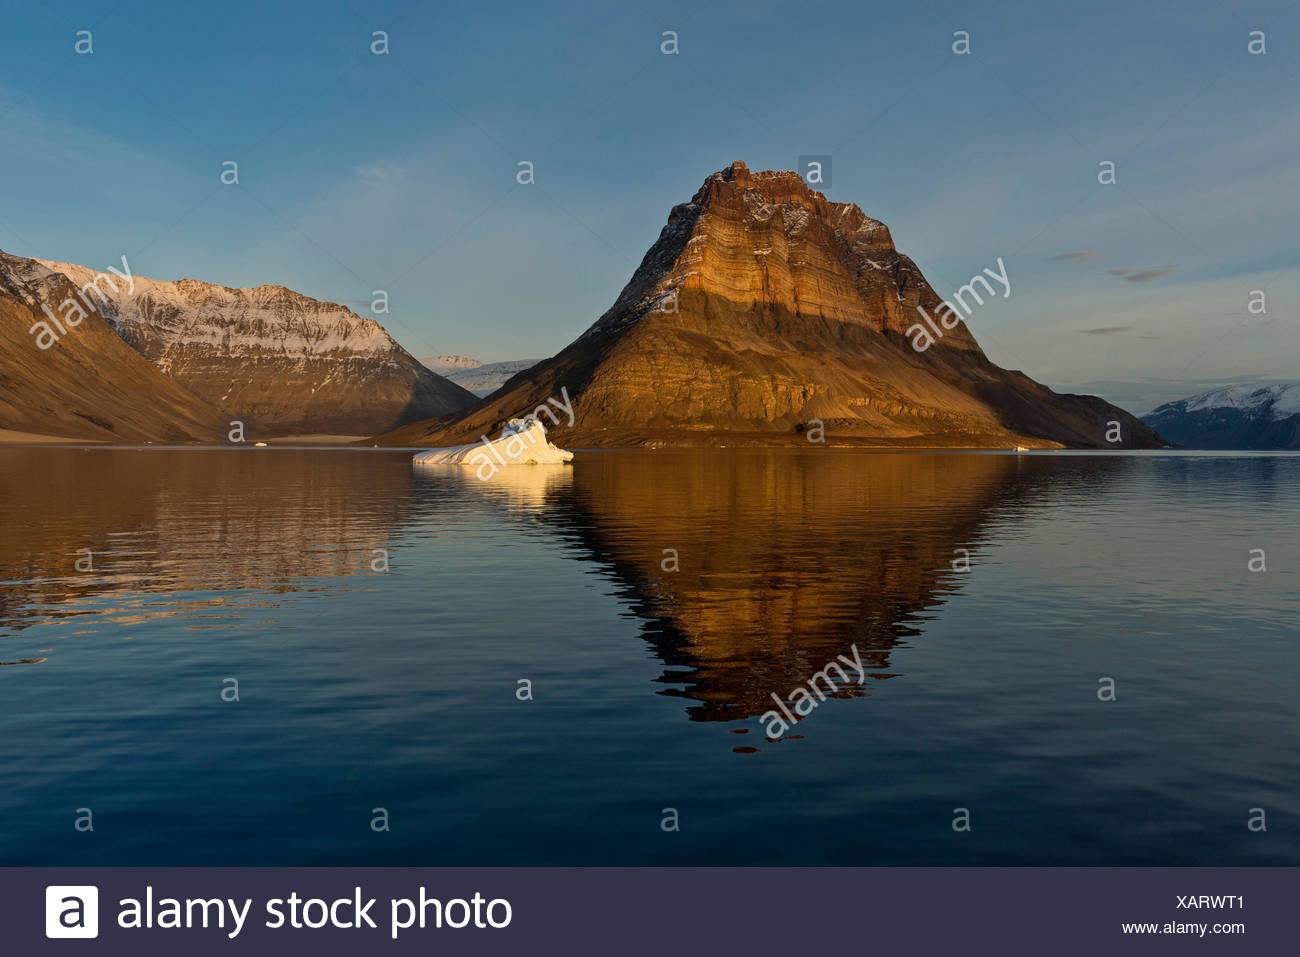 Iceberg in front of Devil's Castle mountain, Kejser Franz Joseph Fjord, Northeast Greenland National Park, Greenland Stock Photo